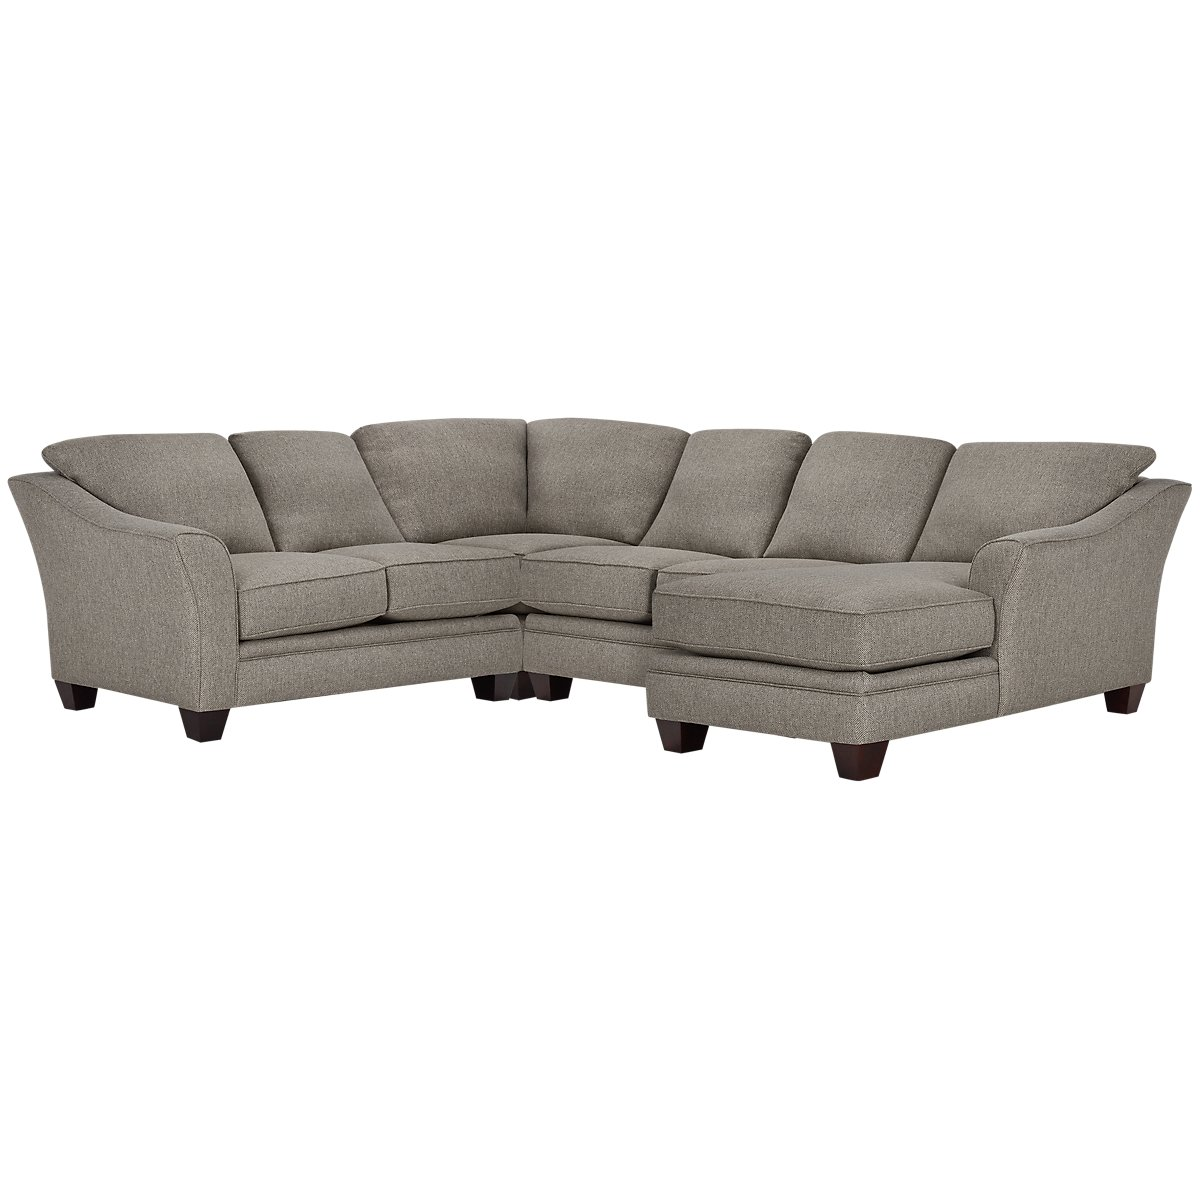 Avery Dark Gray Fabric Medium Right Chaise Sectional